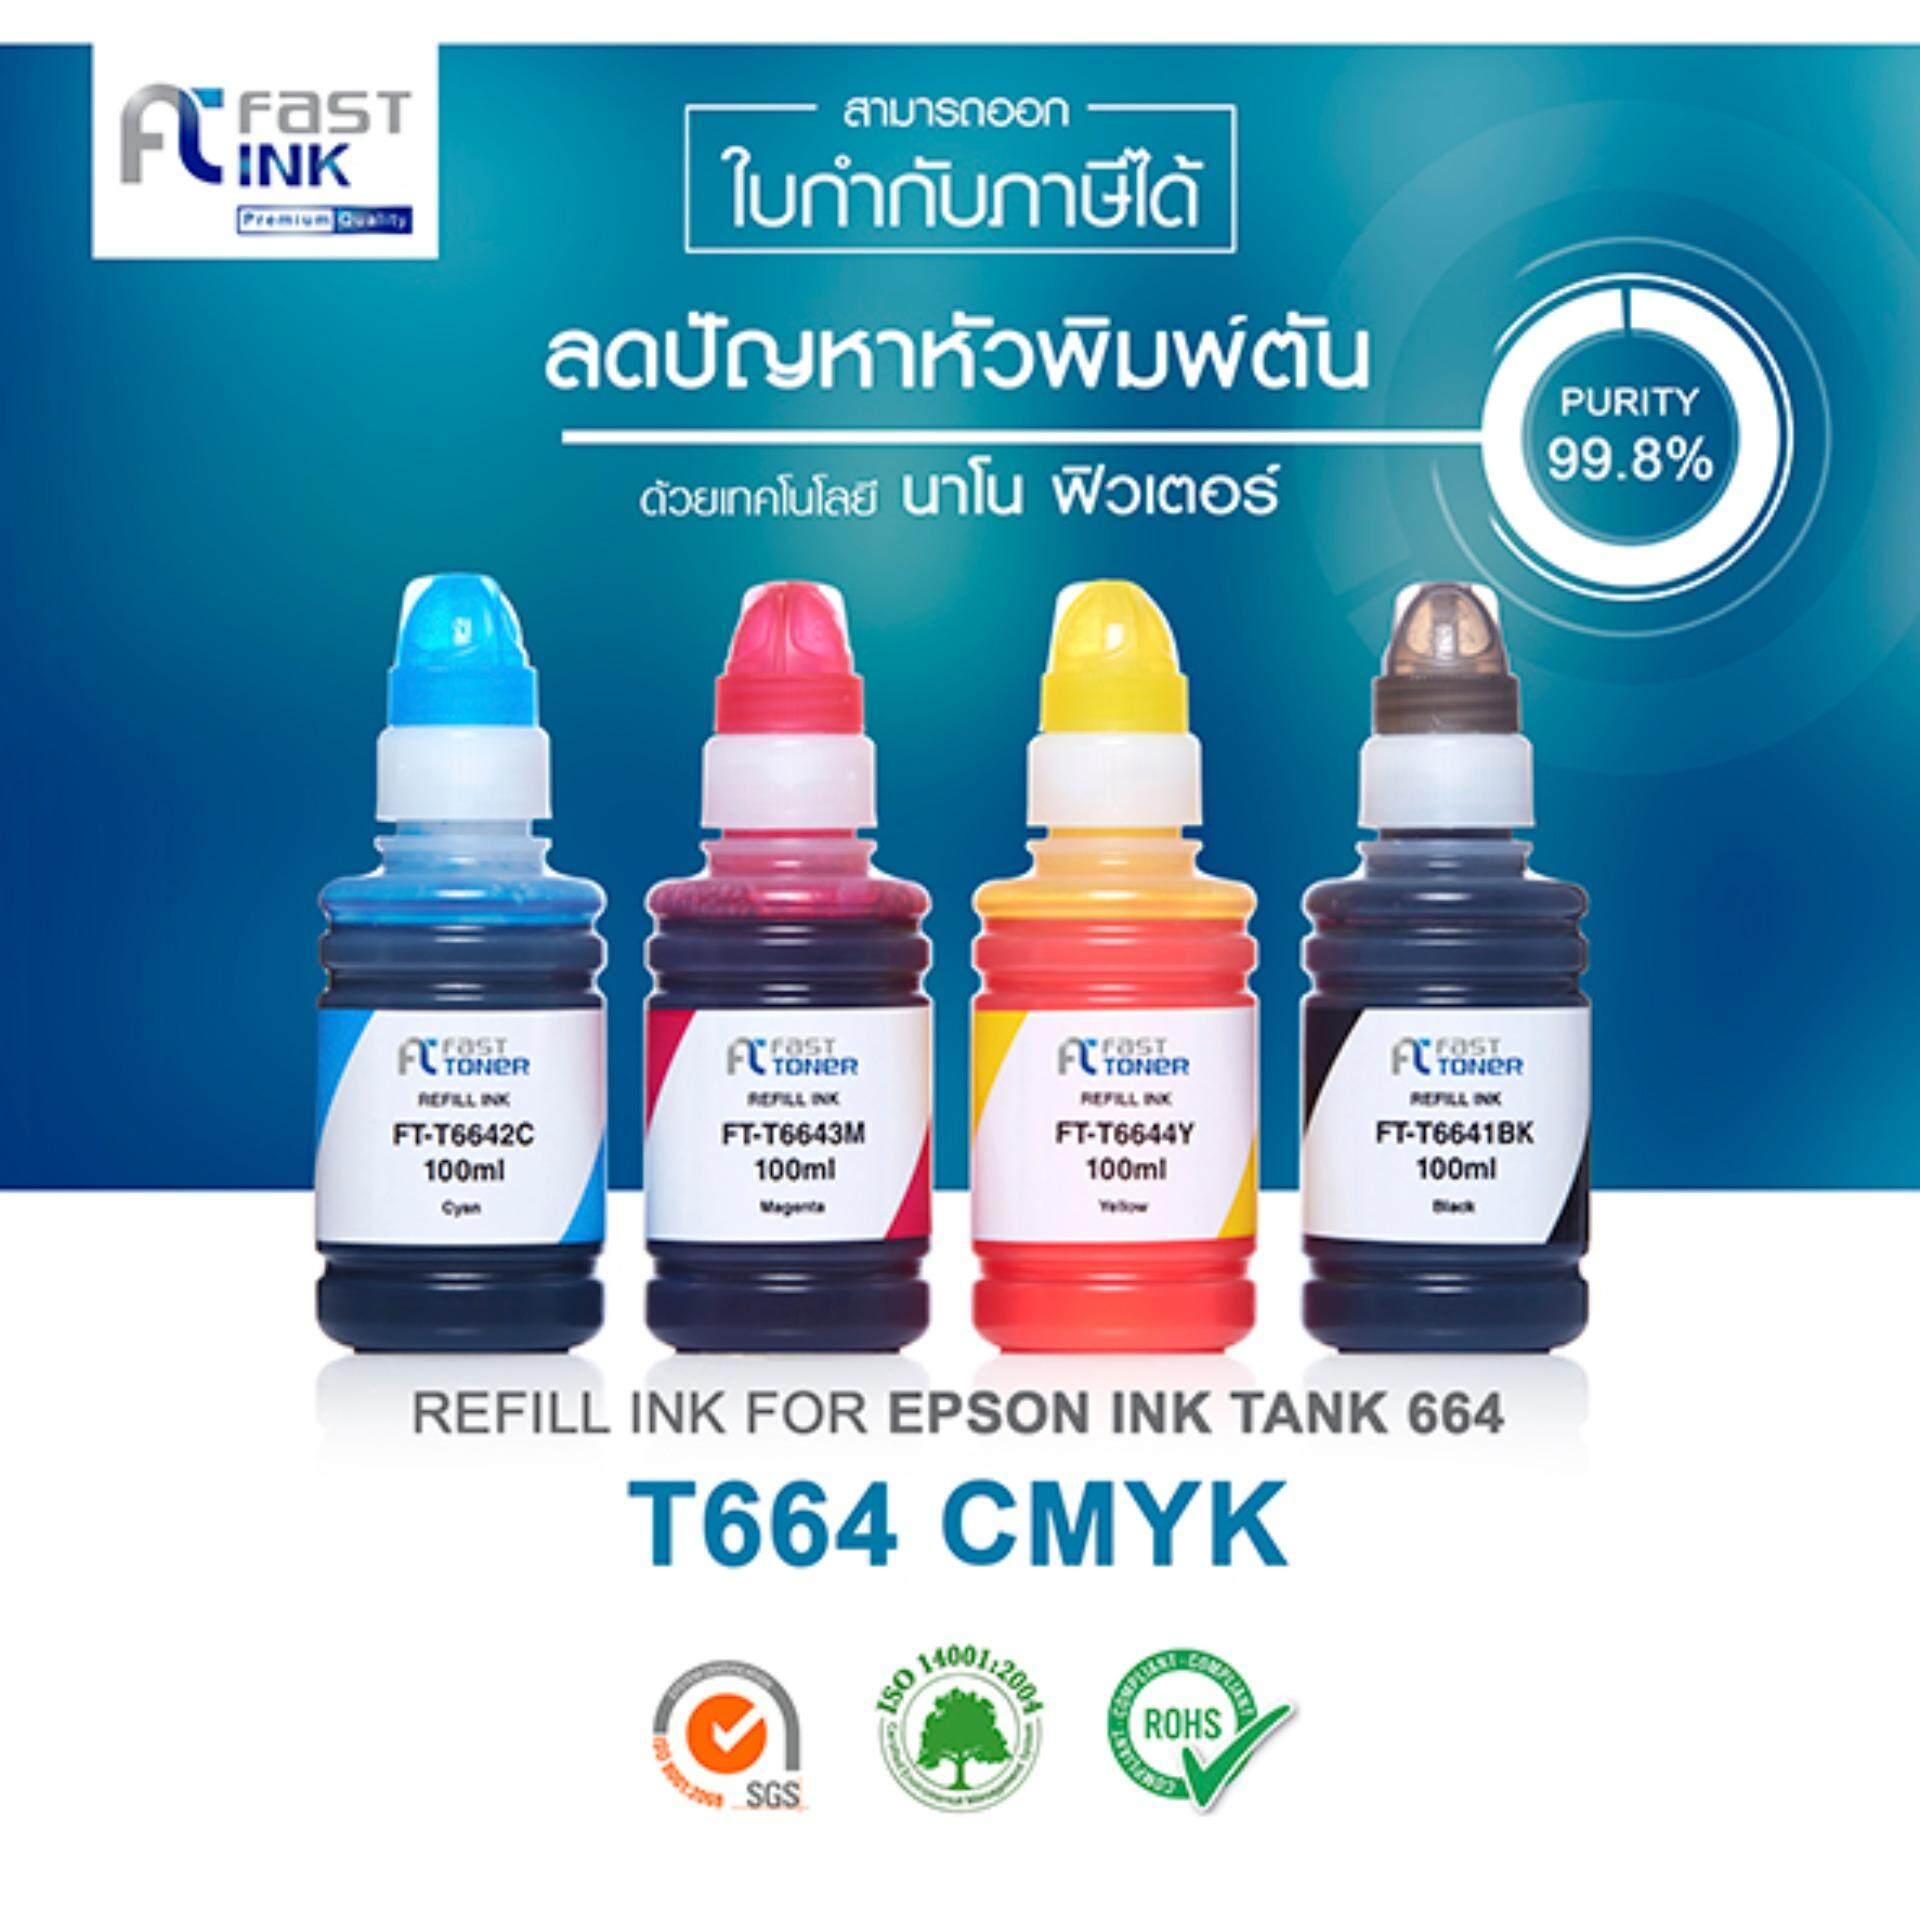 Sell Epson T664 Black Cheapest Best Quality Th Store Tinta Printer Original 664 T6641 T6642 T6643 T6644 L 120 210 360 455 565 1300 Thb 285 Series